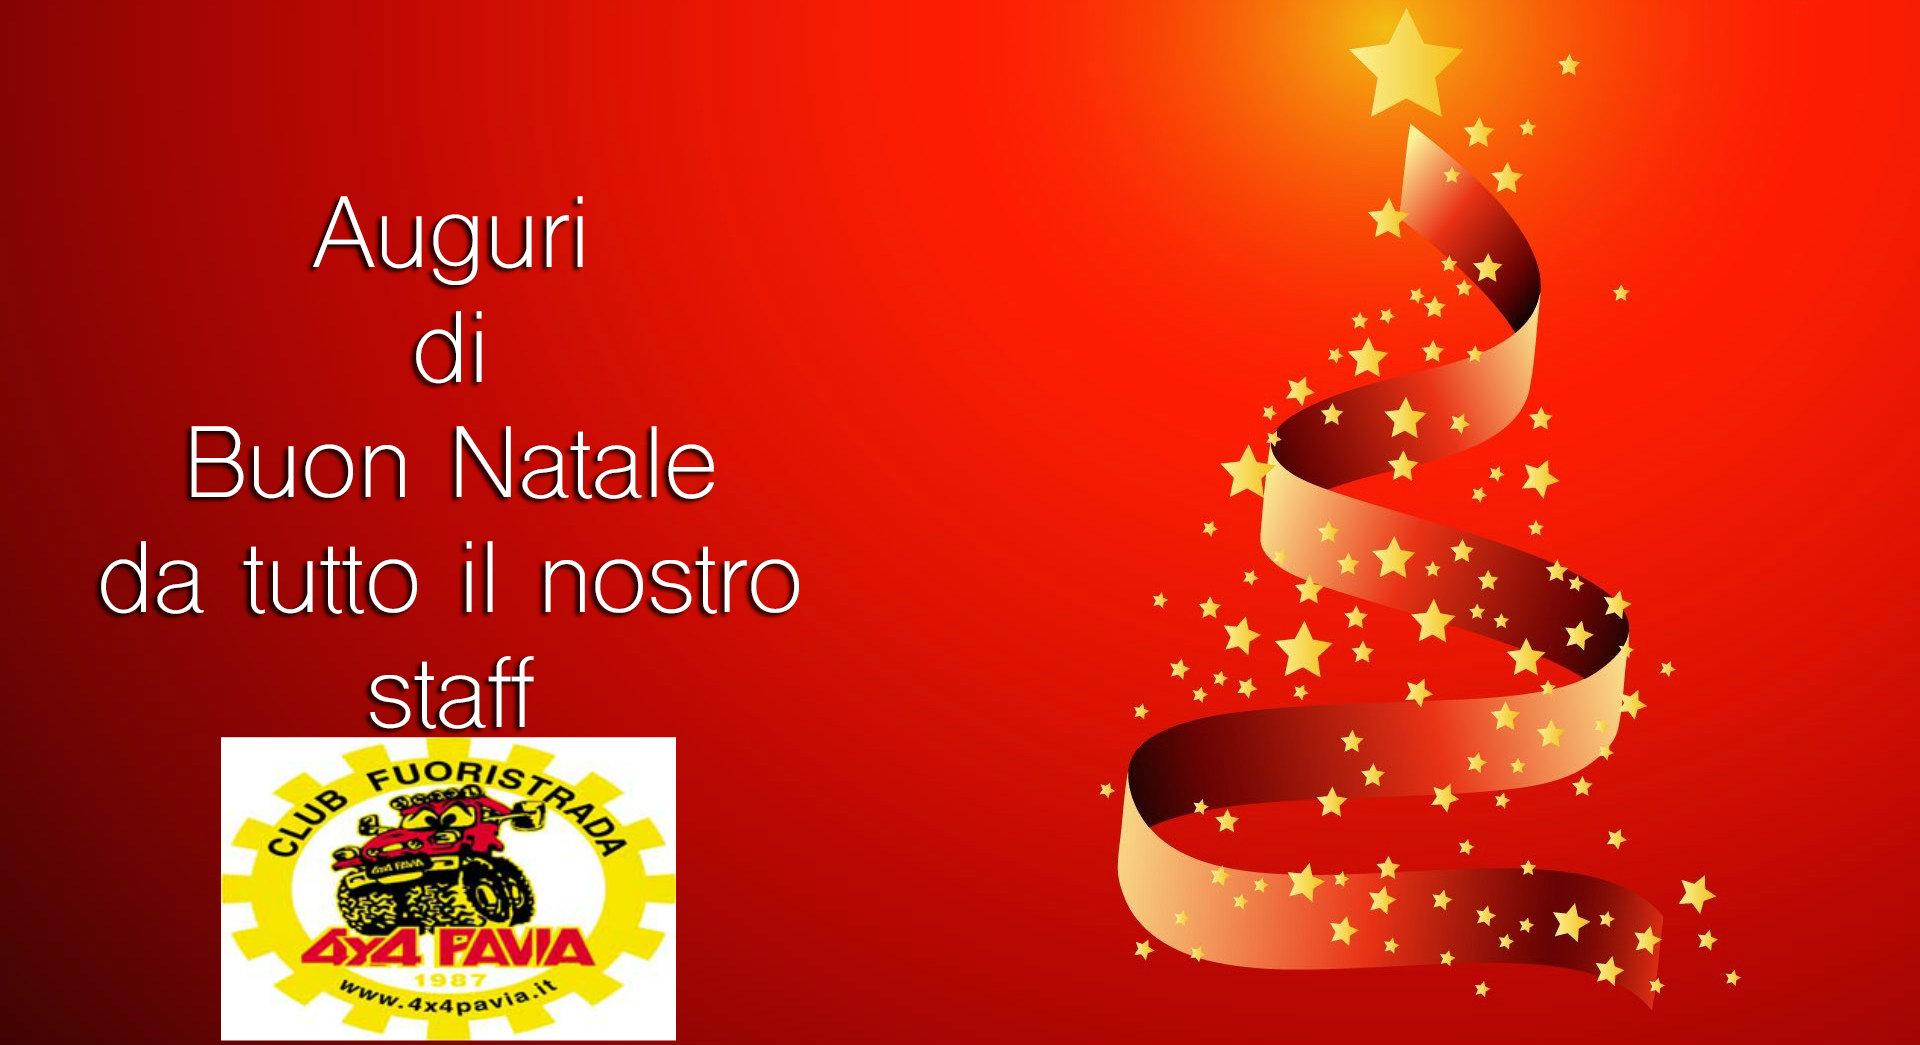 Buon Natale 4x4.Buon Natale 4x4 Bis 4x4 Pavia